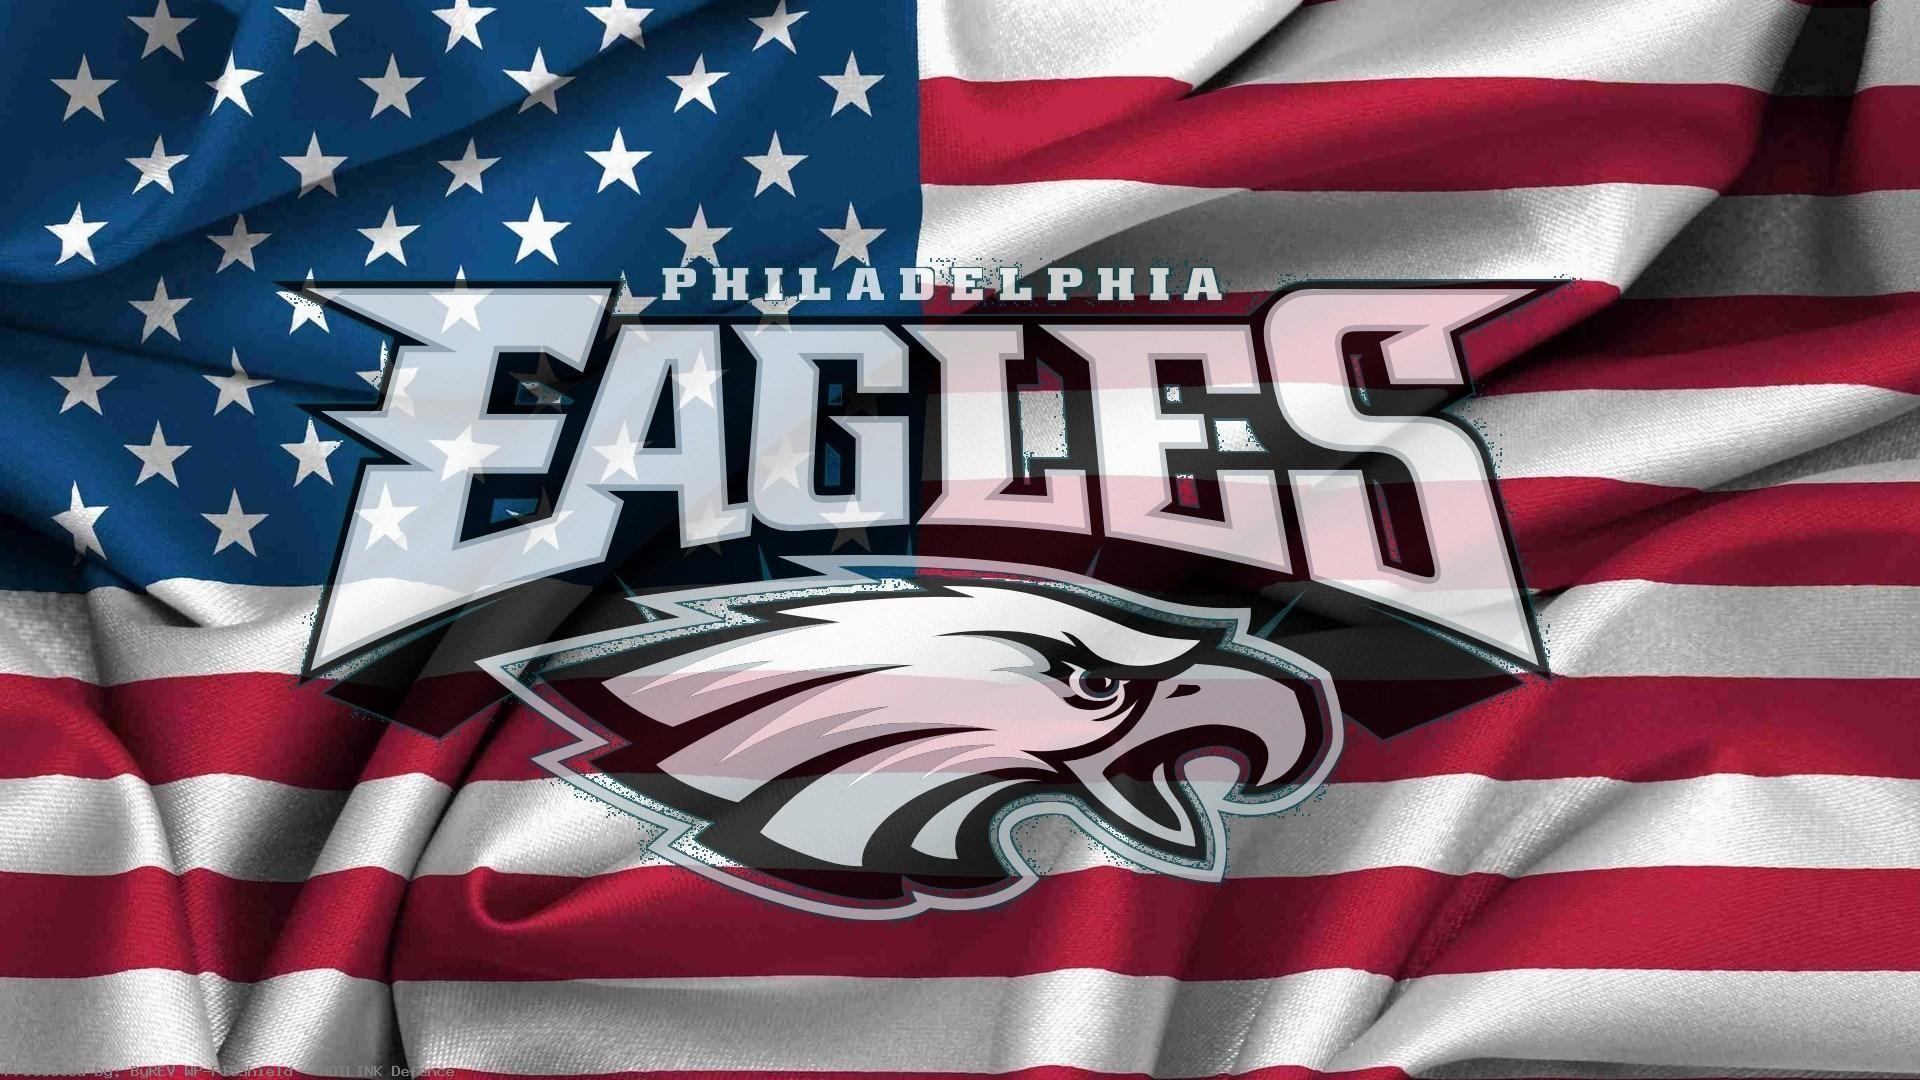 philadelphia-eagles-free-desktop-downloads-wallpaper-wp60010876